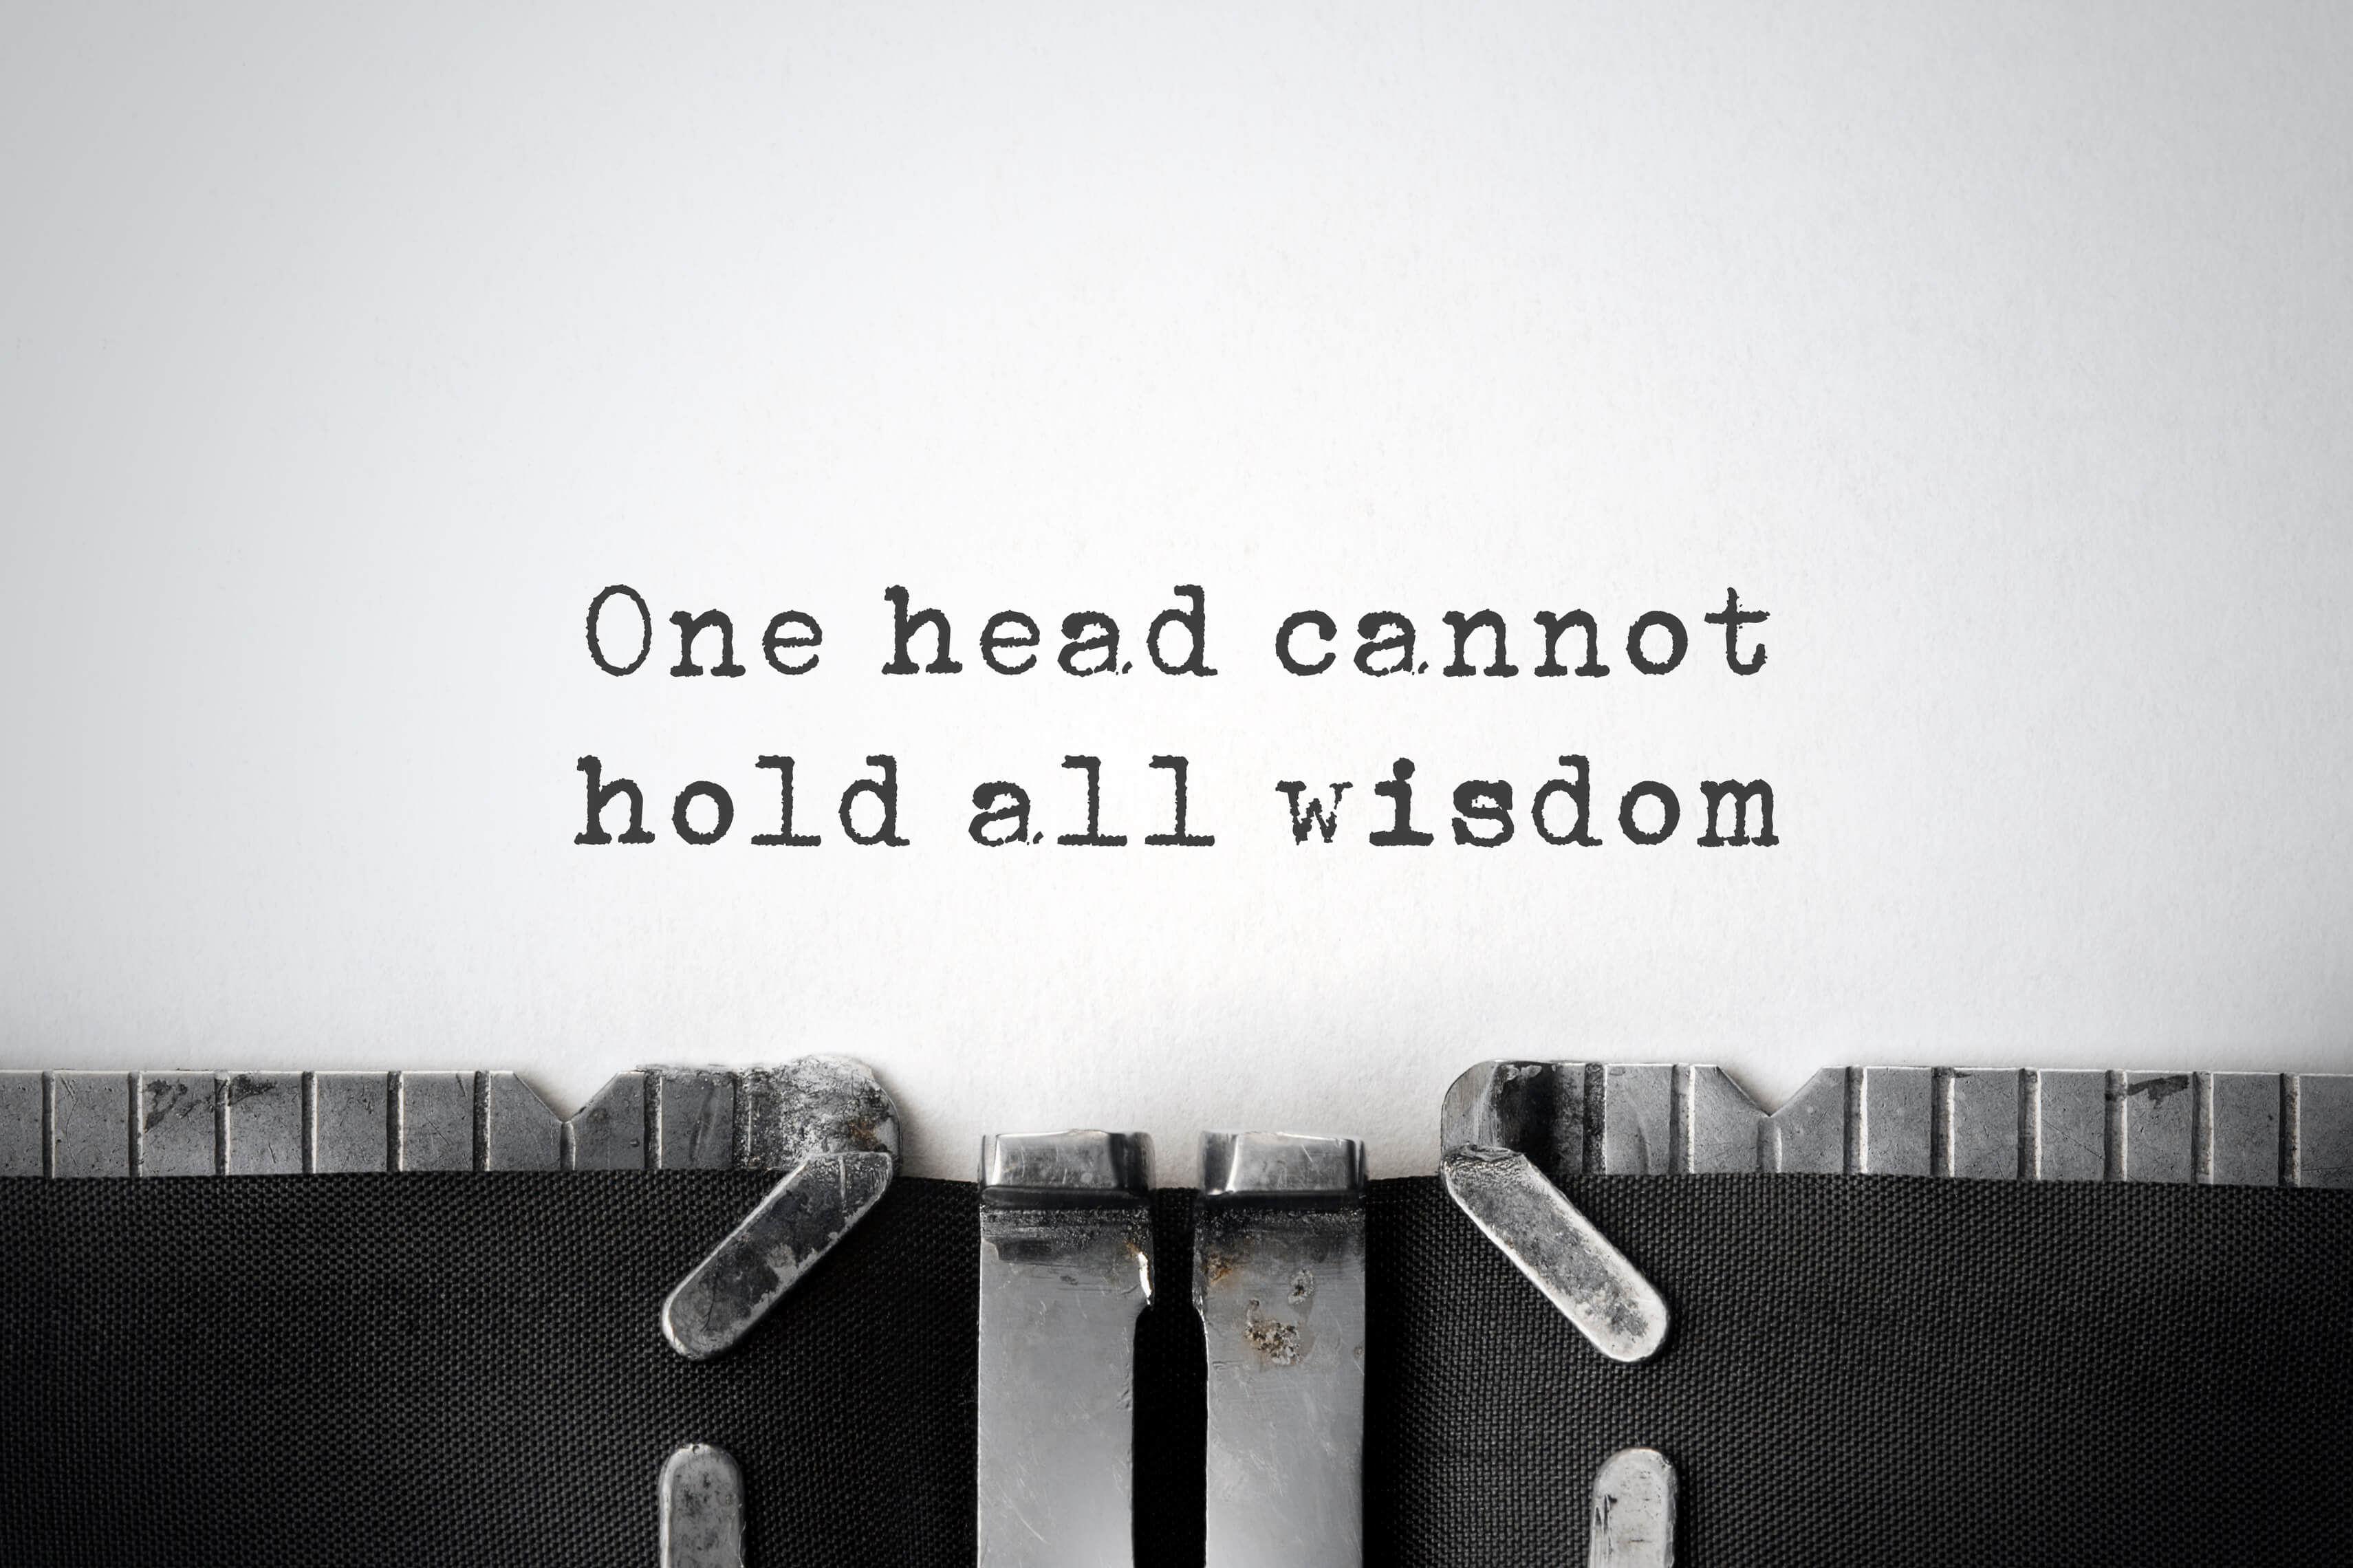 Wisdom quote (Foto by markrubens - Fotolia.com)